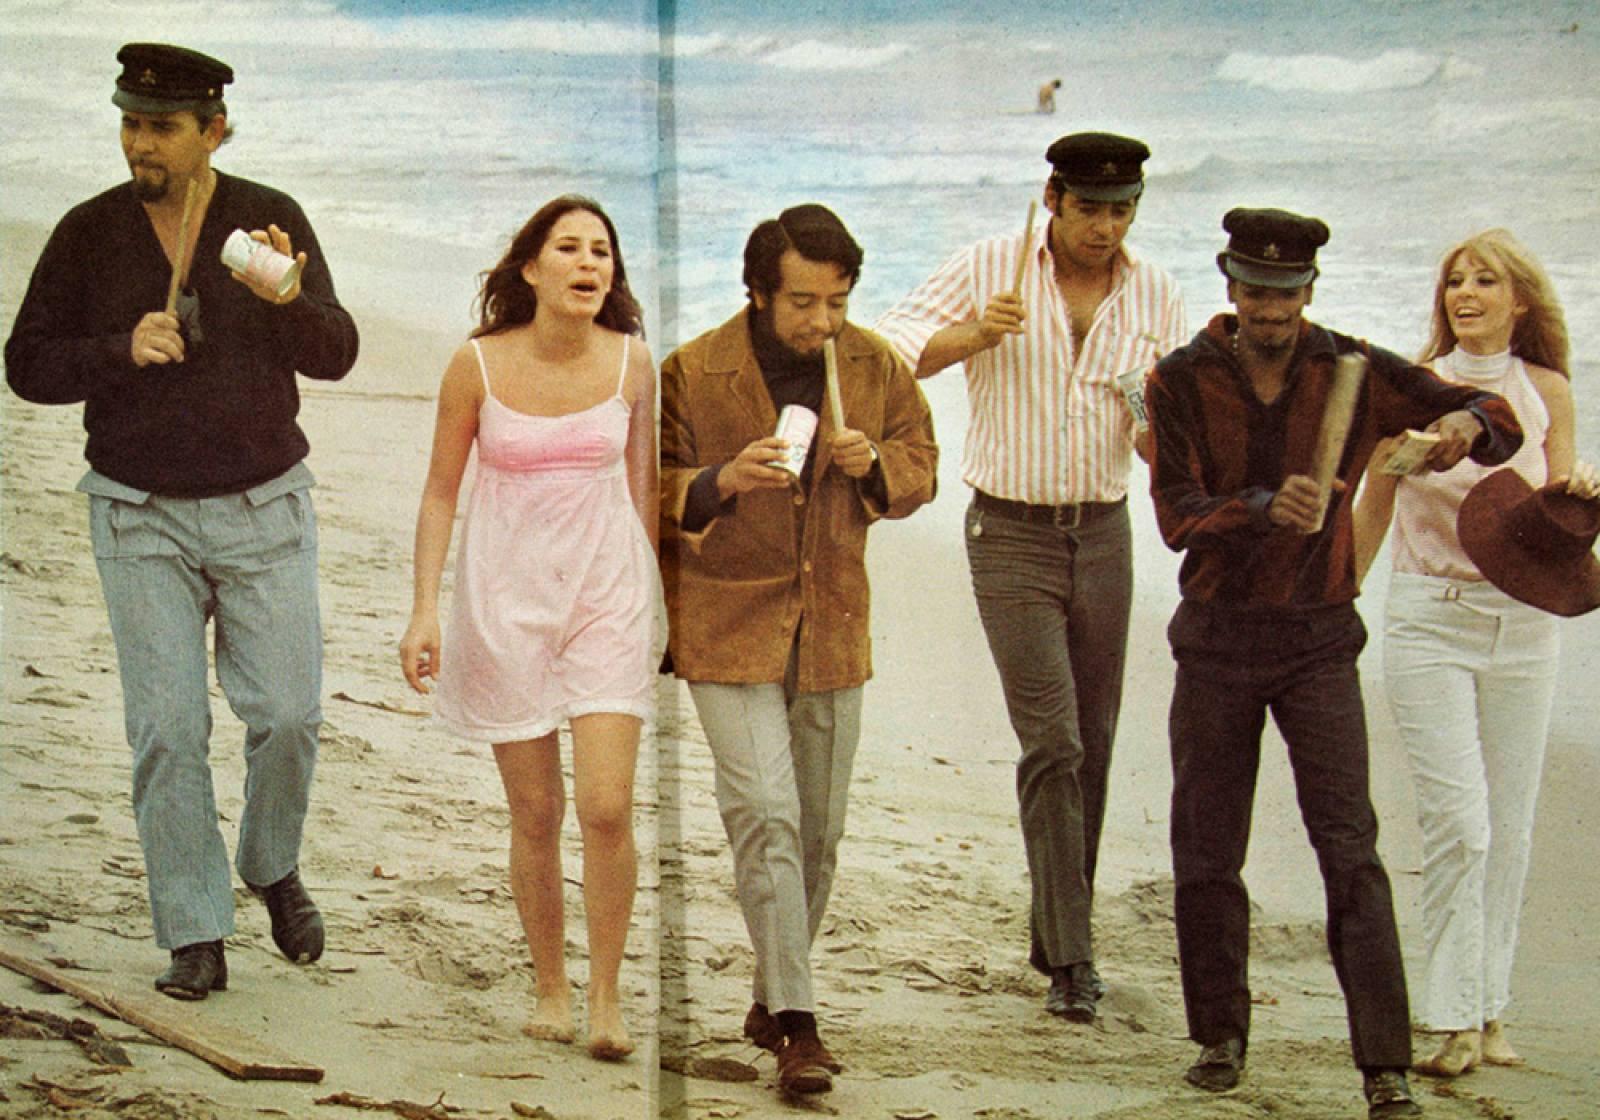 PHOTO 8 - Sergio Mendes & Brasil 66 - Beach